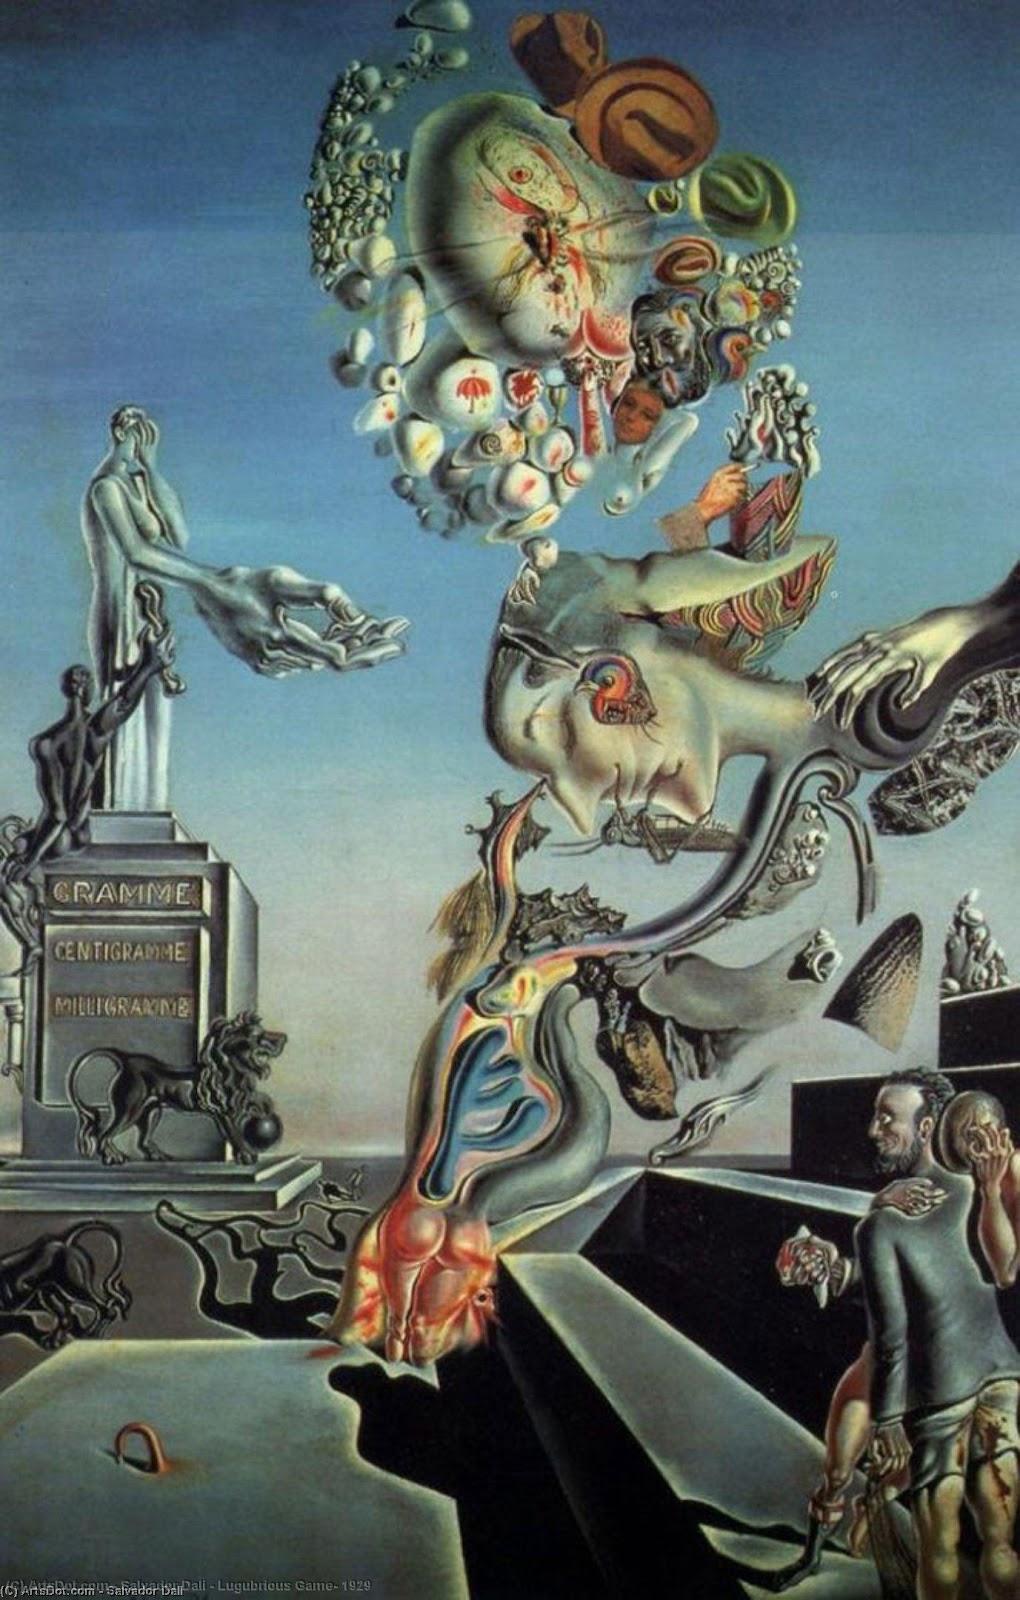 http://images.wikioo.org/ADC/Art-ImgScreen-1.nsf/O/A-5ZKEXH/$FILE/Salvador-dali-lugubrious-game-1929.Jpg